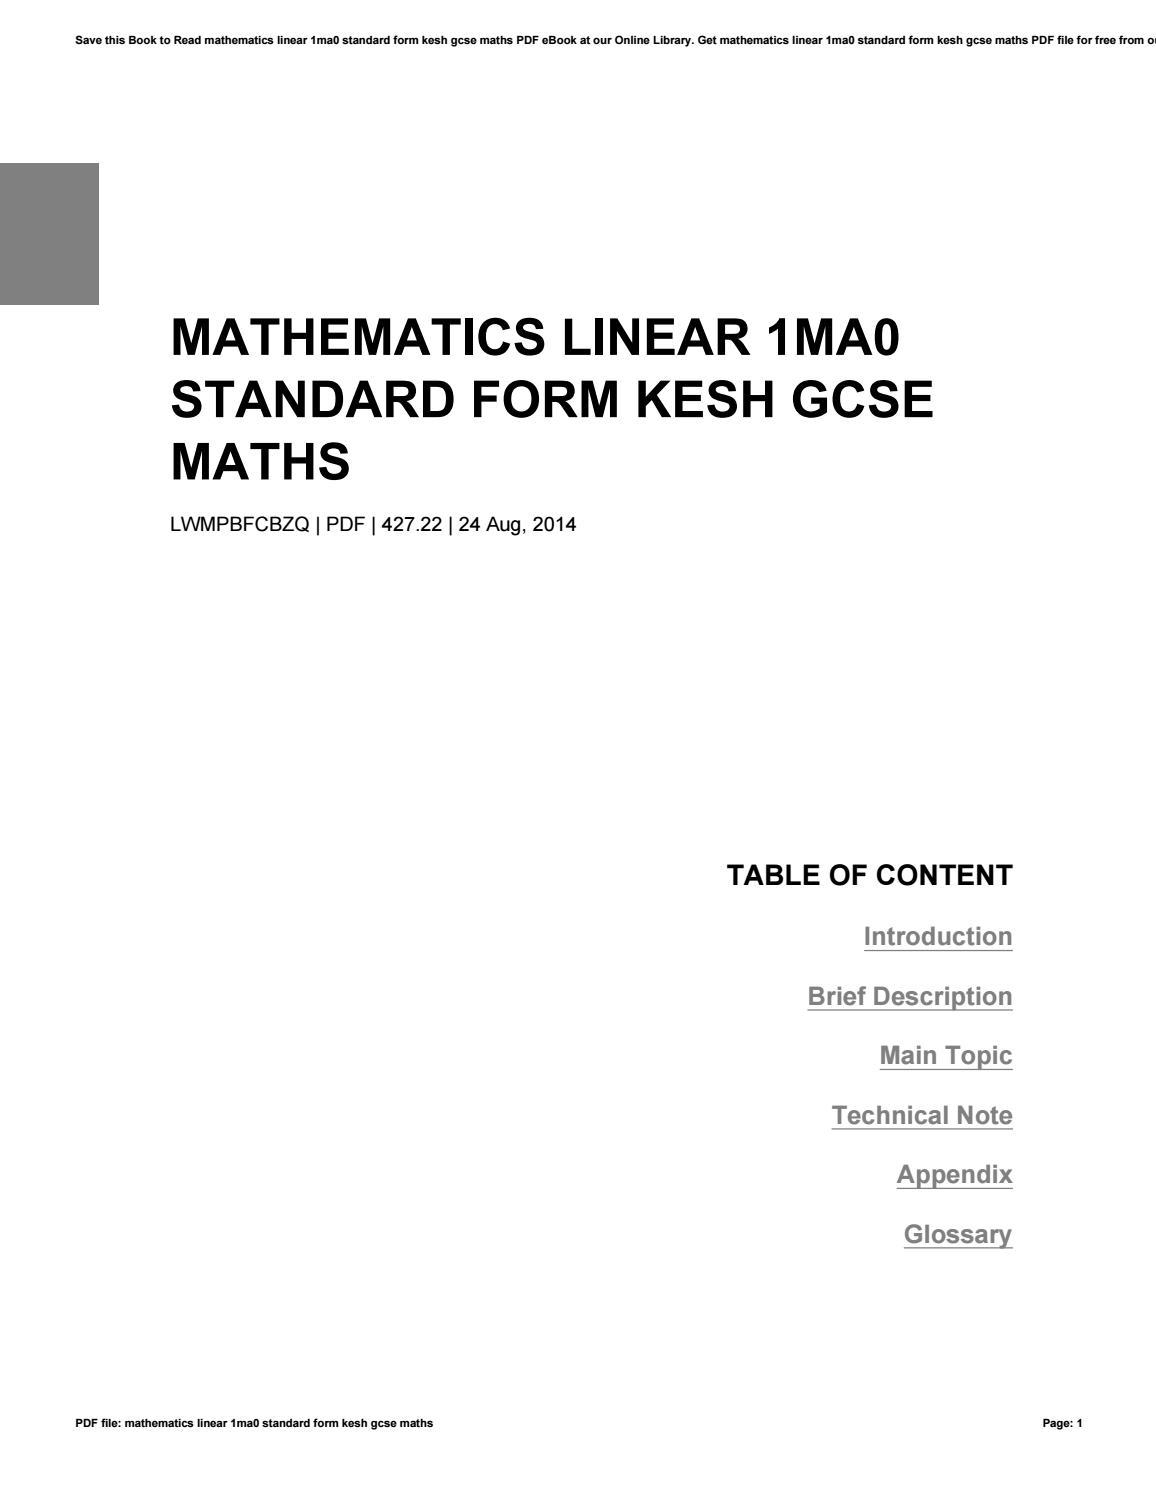 Mathematics Linear 1ma0 Standard Form Kesh Gcse Maths By Ppetw89 Issuu